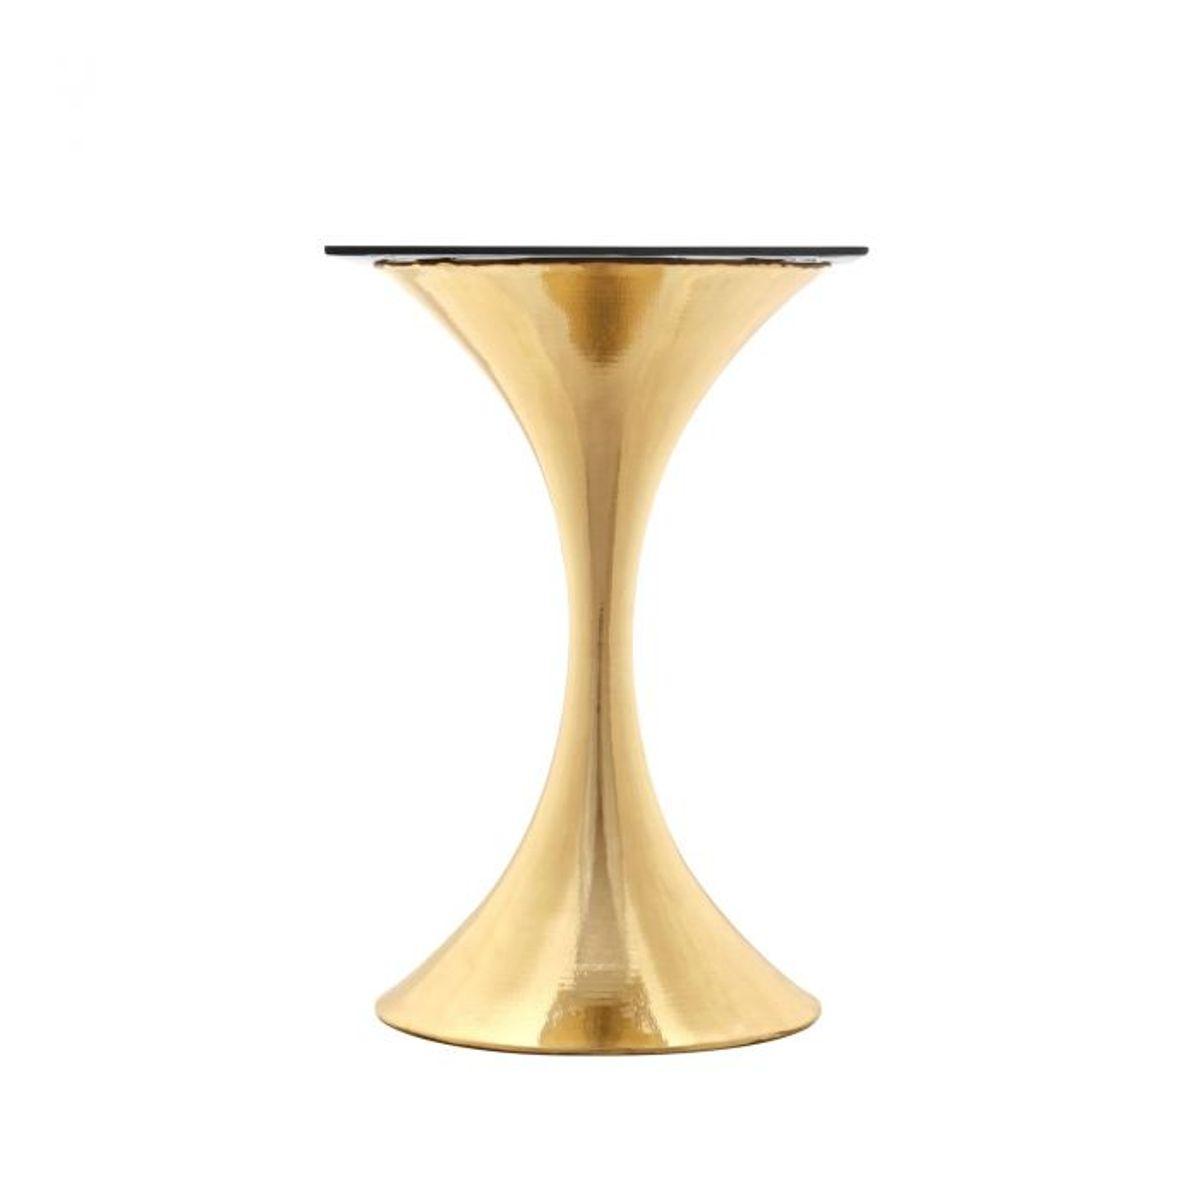 Stockholm Center Dining Table Base, Brass